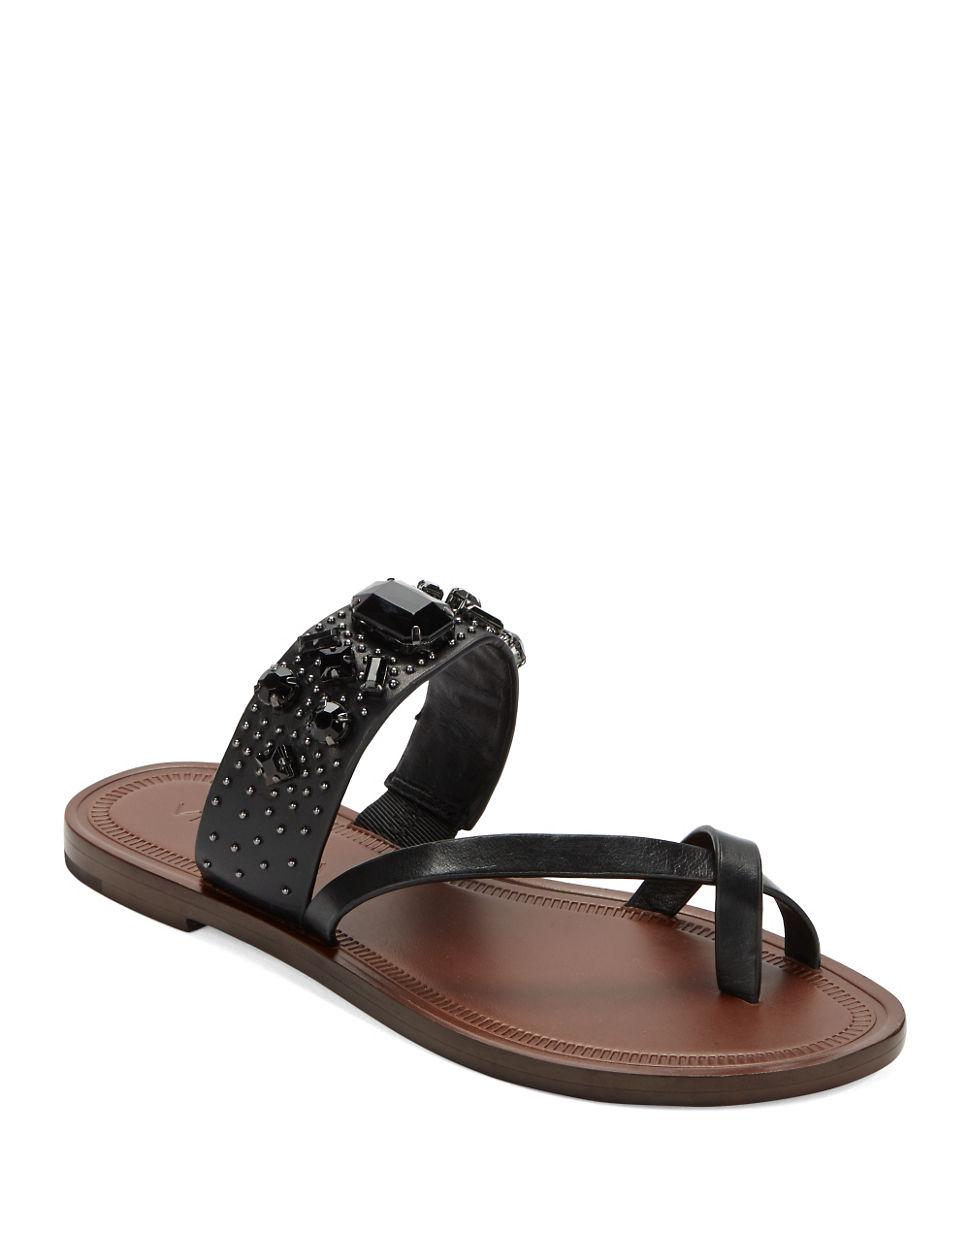 Https Clothing Nike Pro Cool Indy Dri Fit Low Impact Sandal Connec Arizona Navy Fuchsia Woman 36 Via Spiga Black Gwenda Leather Slip On Sandals Product 0 547050019 Normaljpeg